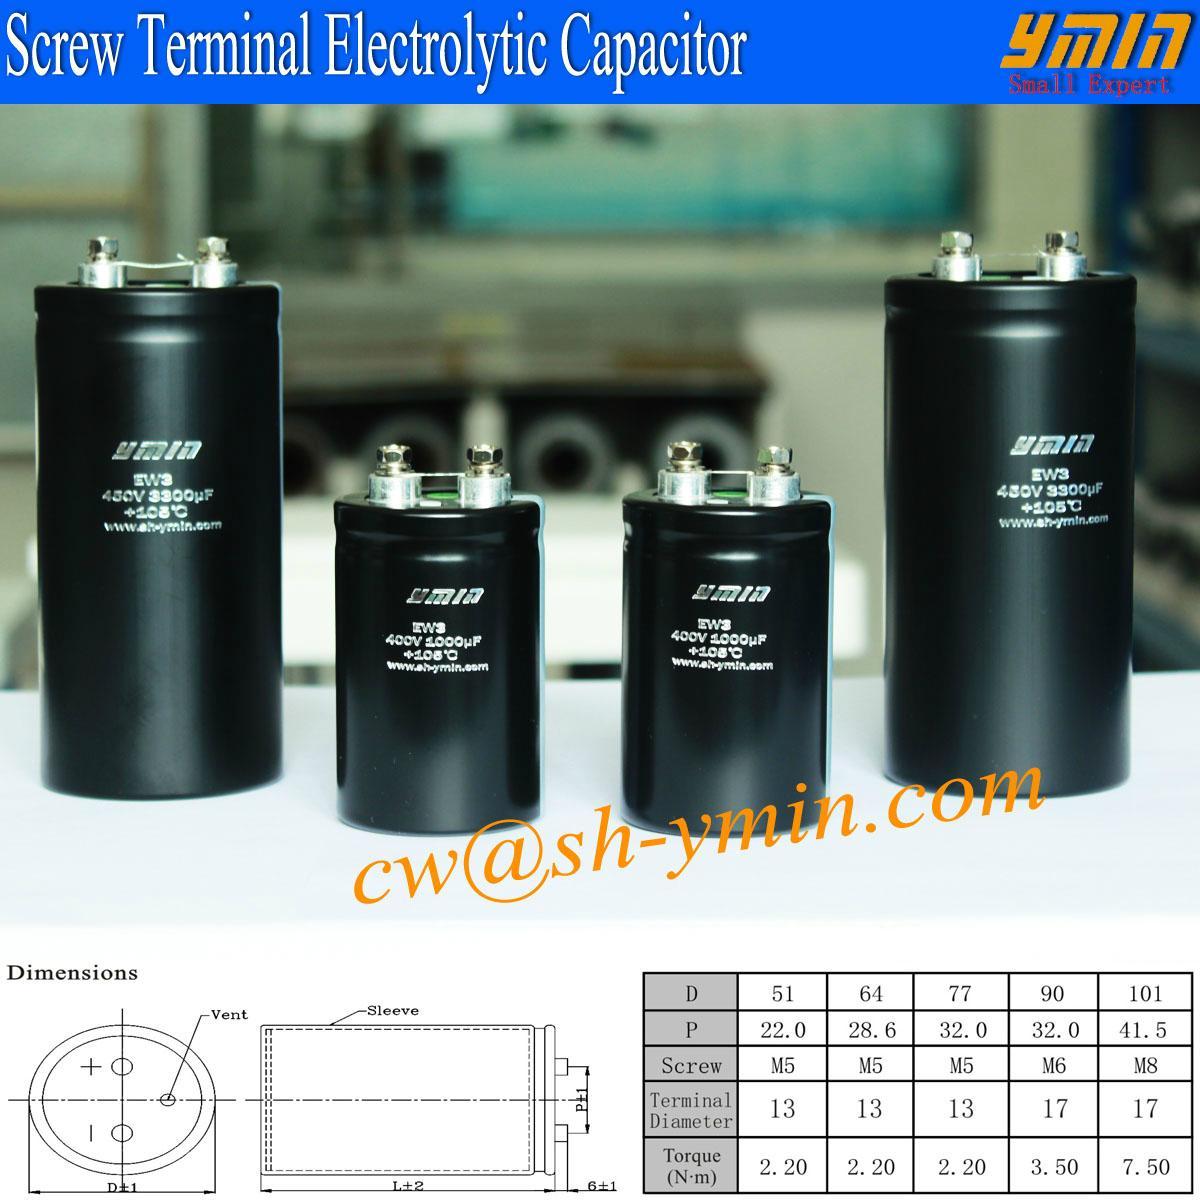 UPS Large Screw Terminal  Aluminum Electrolytic Capacitor high ripple current 1